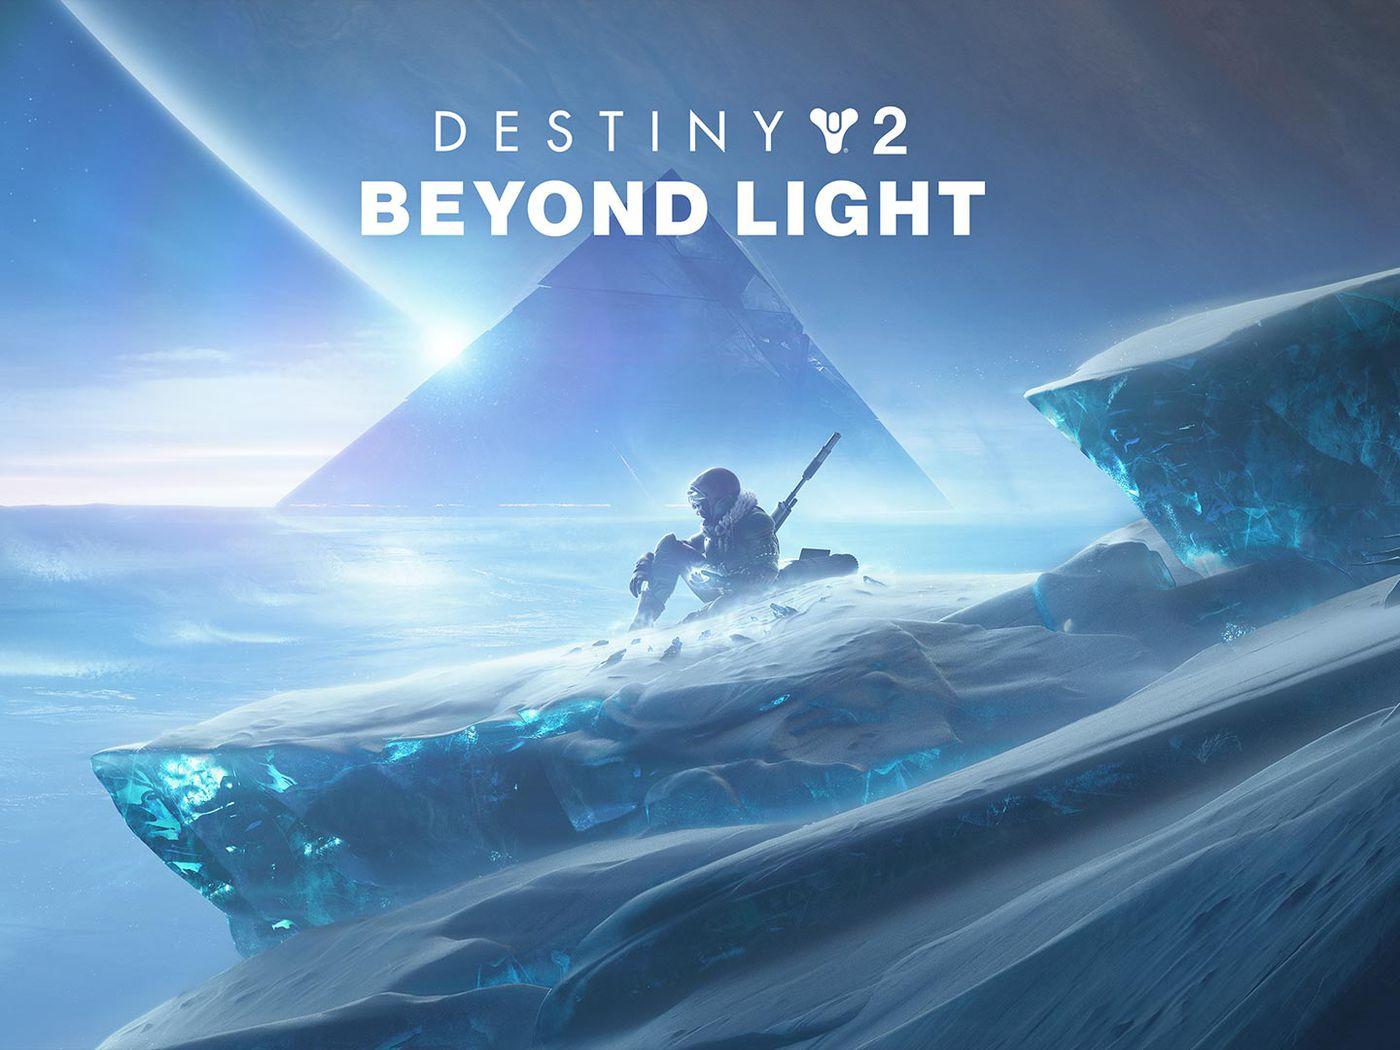 destiny beyond light